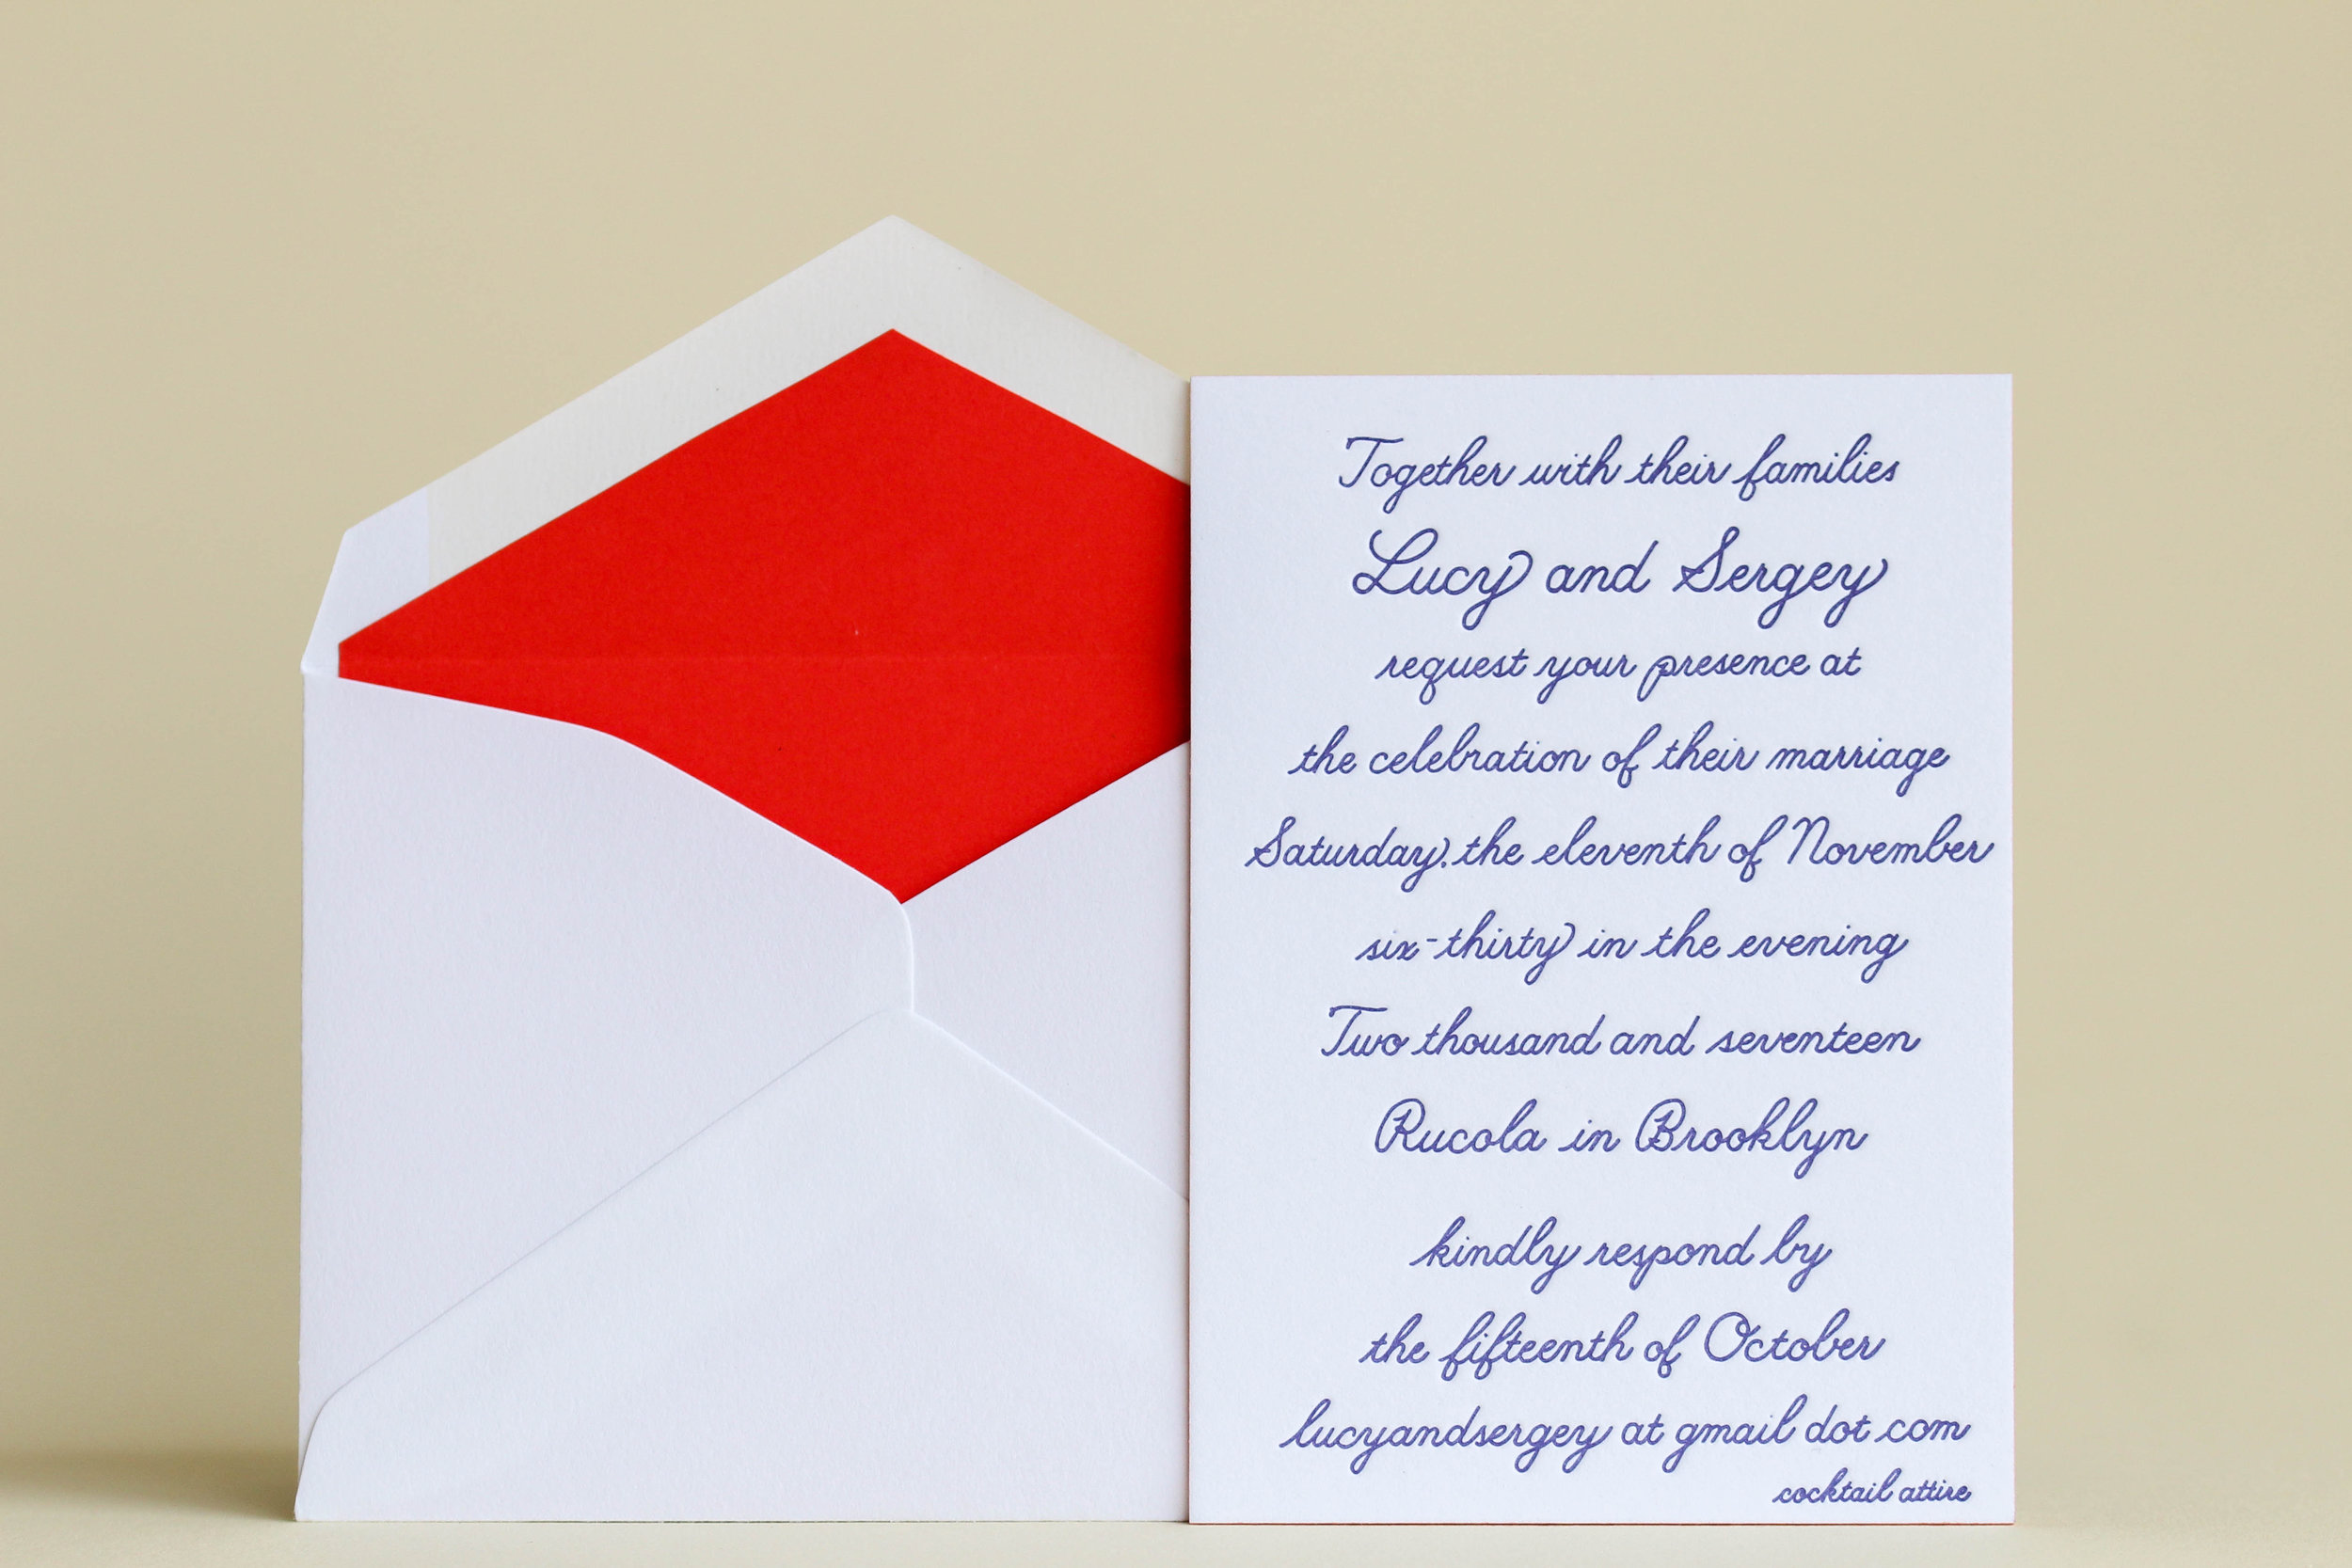 Lucy x Sergey Wedding Invitation